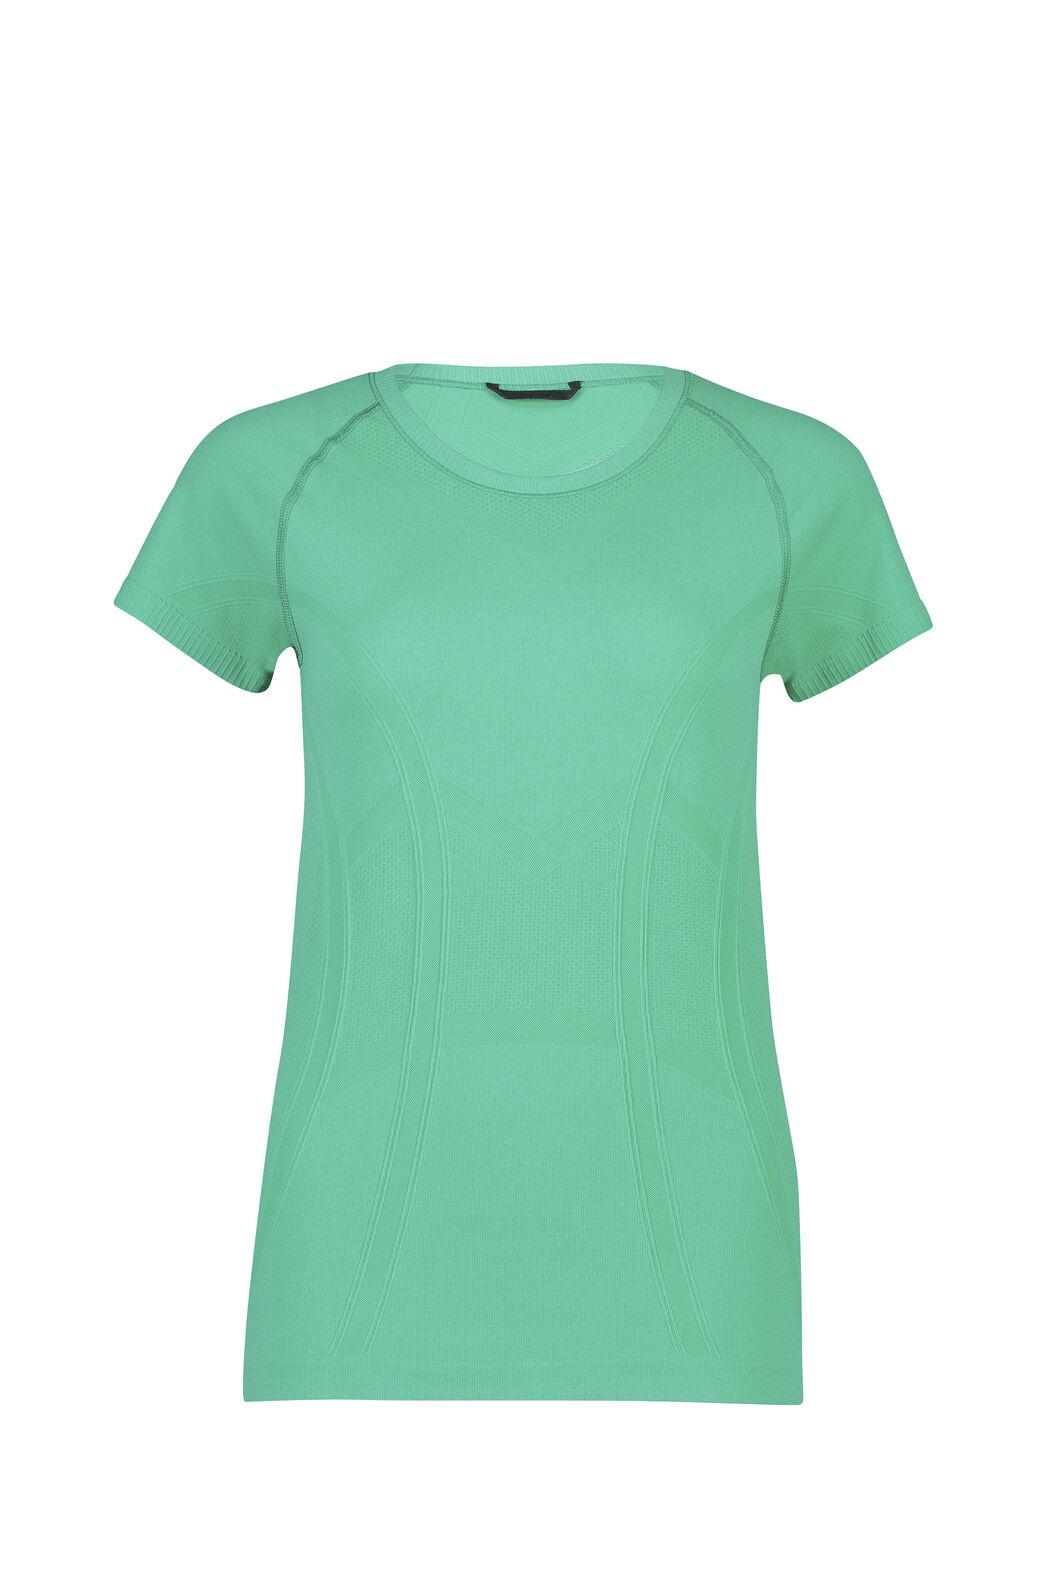 Macpac Limitless Short Sleeve Tee - Women's, Deep Green, hi-res